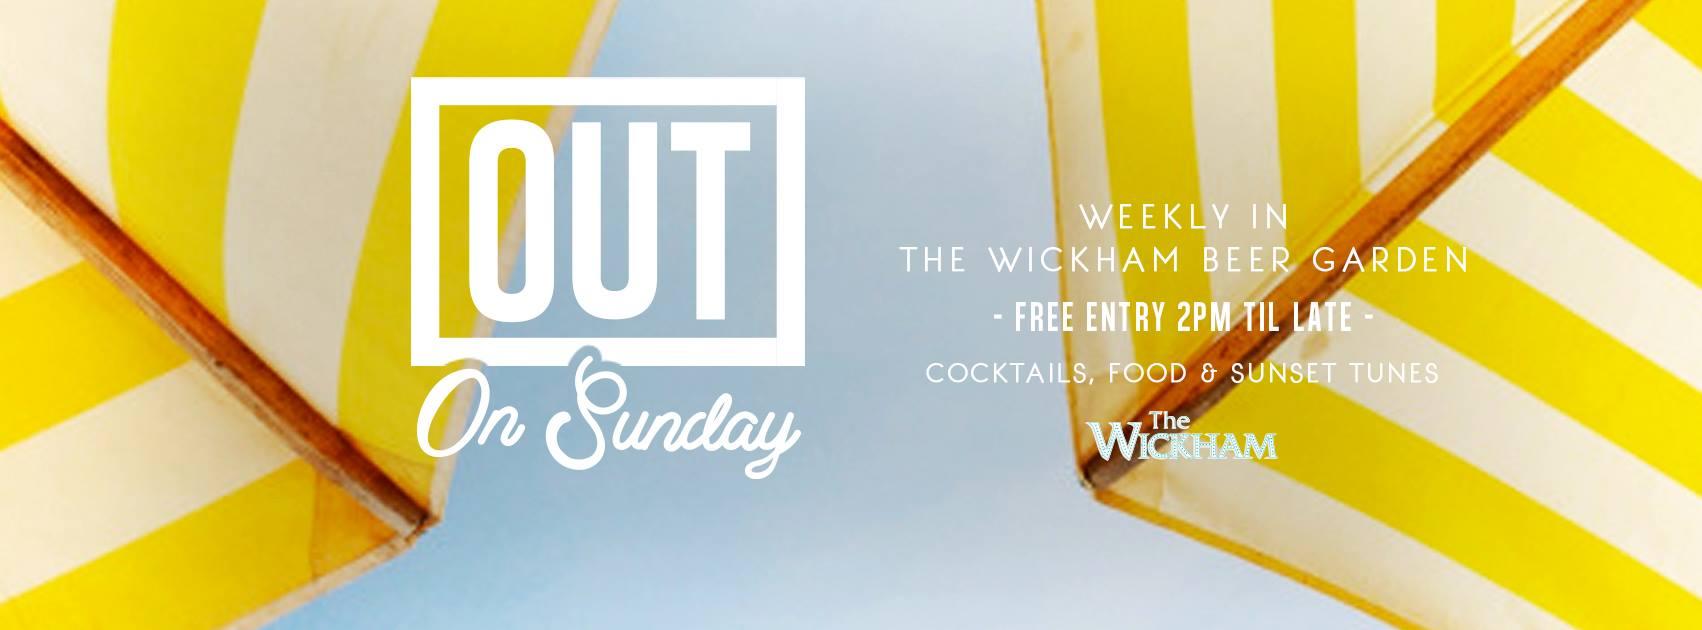 wickham out on sunday 8.11.15